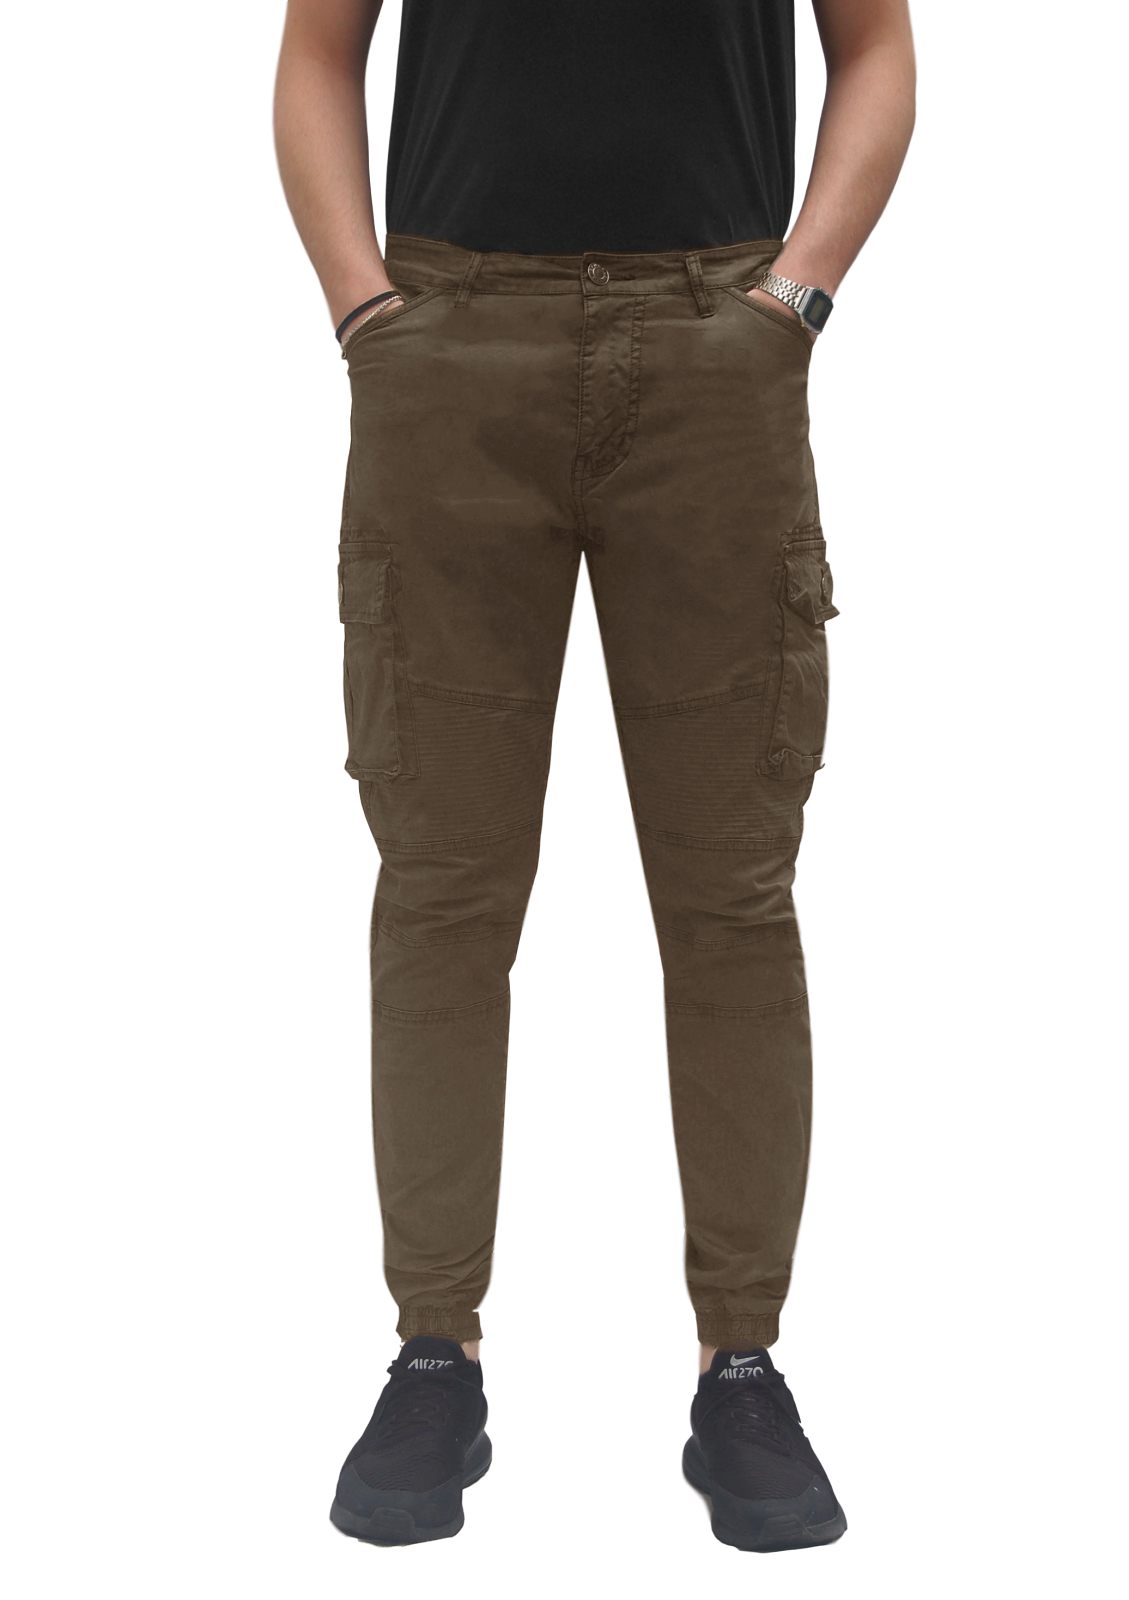 Pantalone-Uomo-Cargo-Con-Tasconi-Invernale-Verde-Blu-Nero-Marrone-Pantaloni-slim miniatura 26